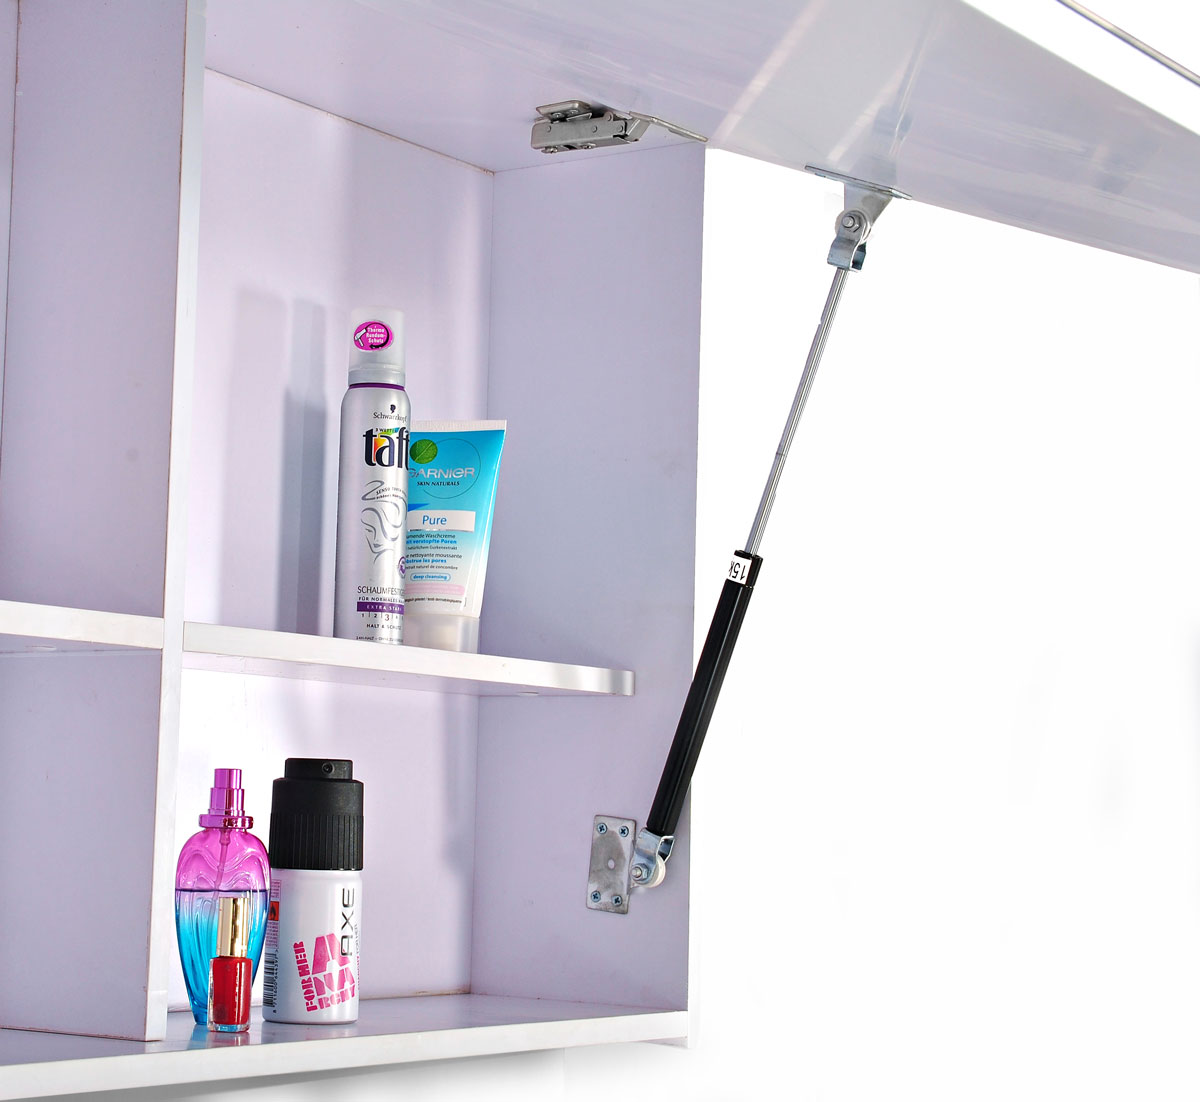 badezimmer 2. wahl   badezimmer blog, Badezimmer ideen